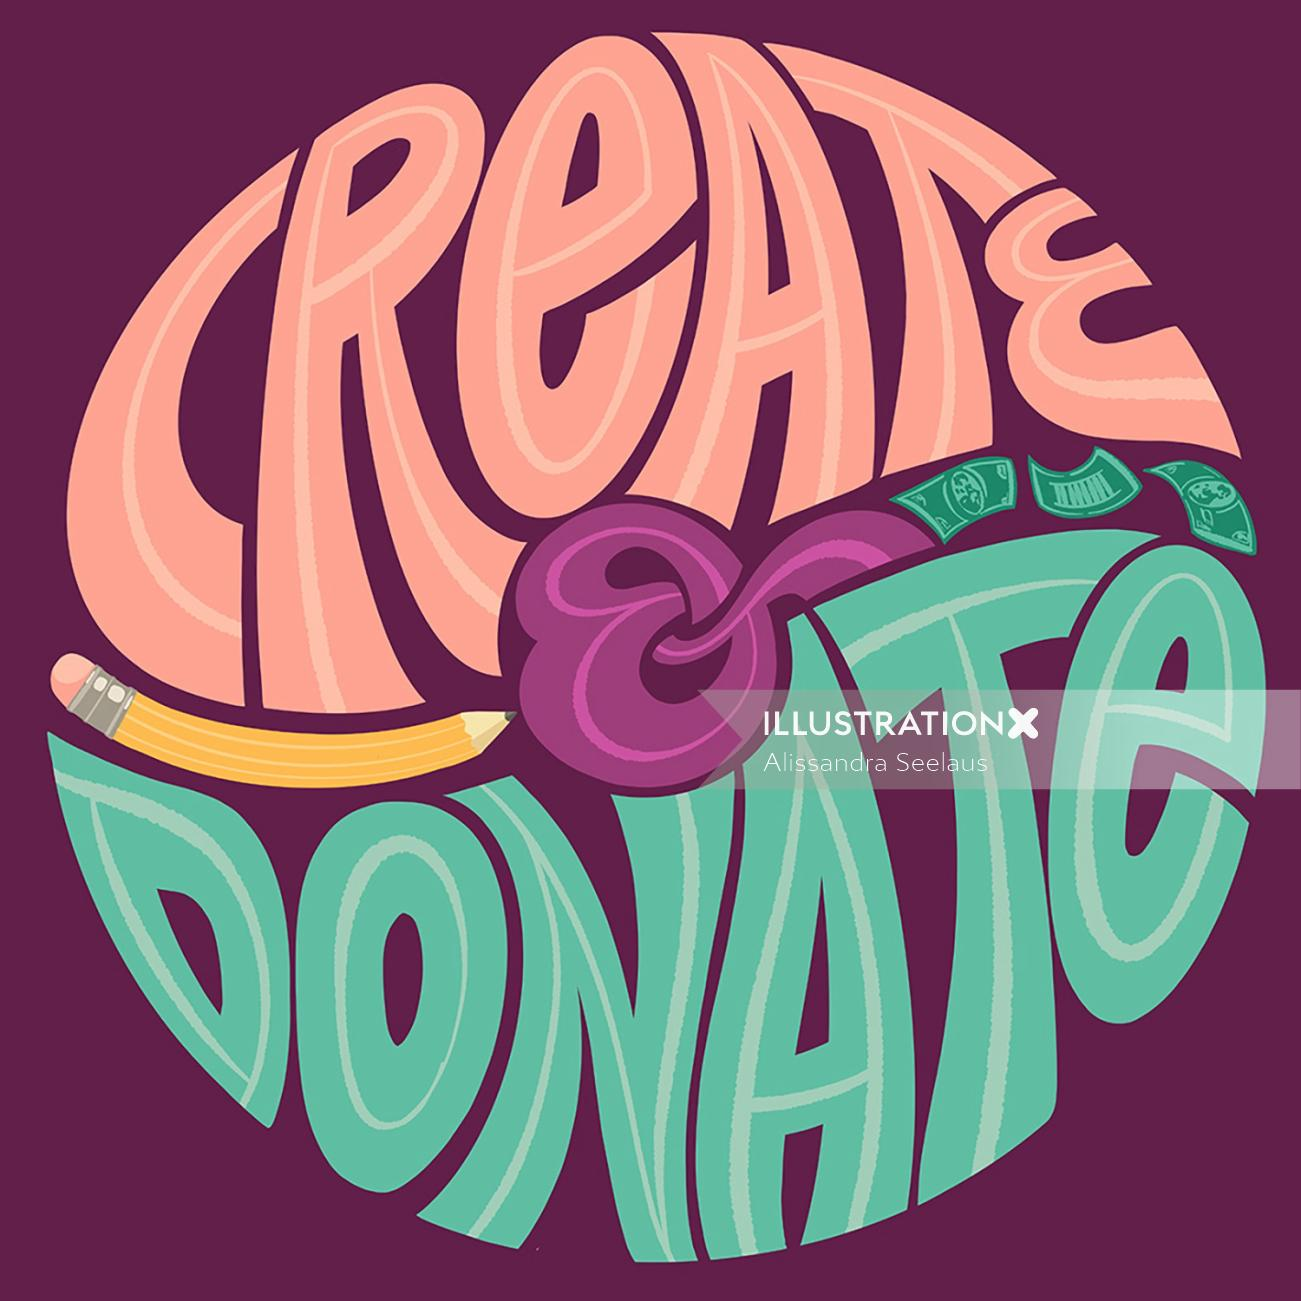 Conceptual lettering of create & donate